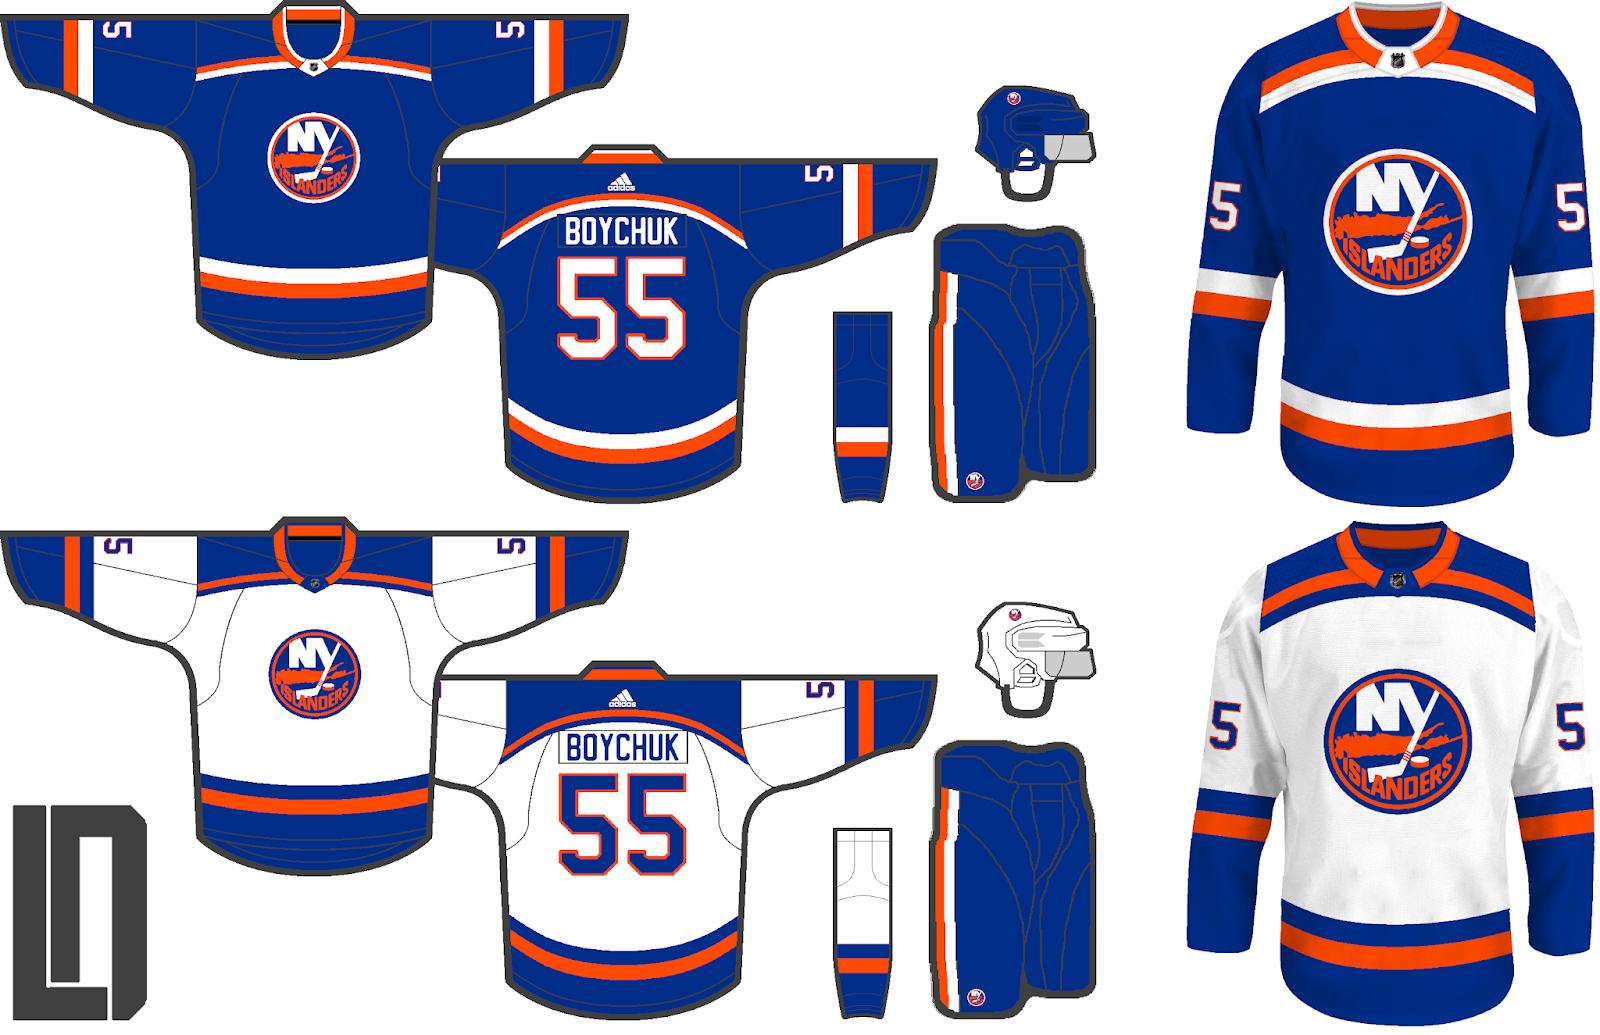 New+York+Islanders+Concept+2.png